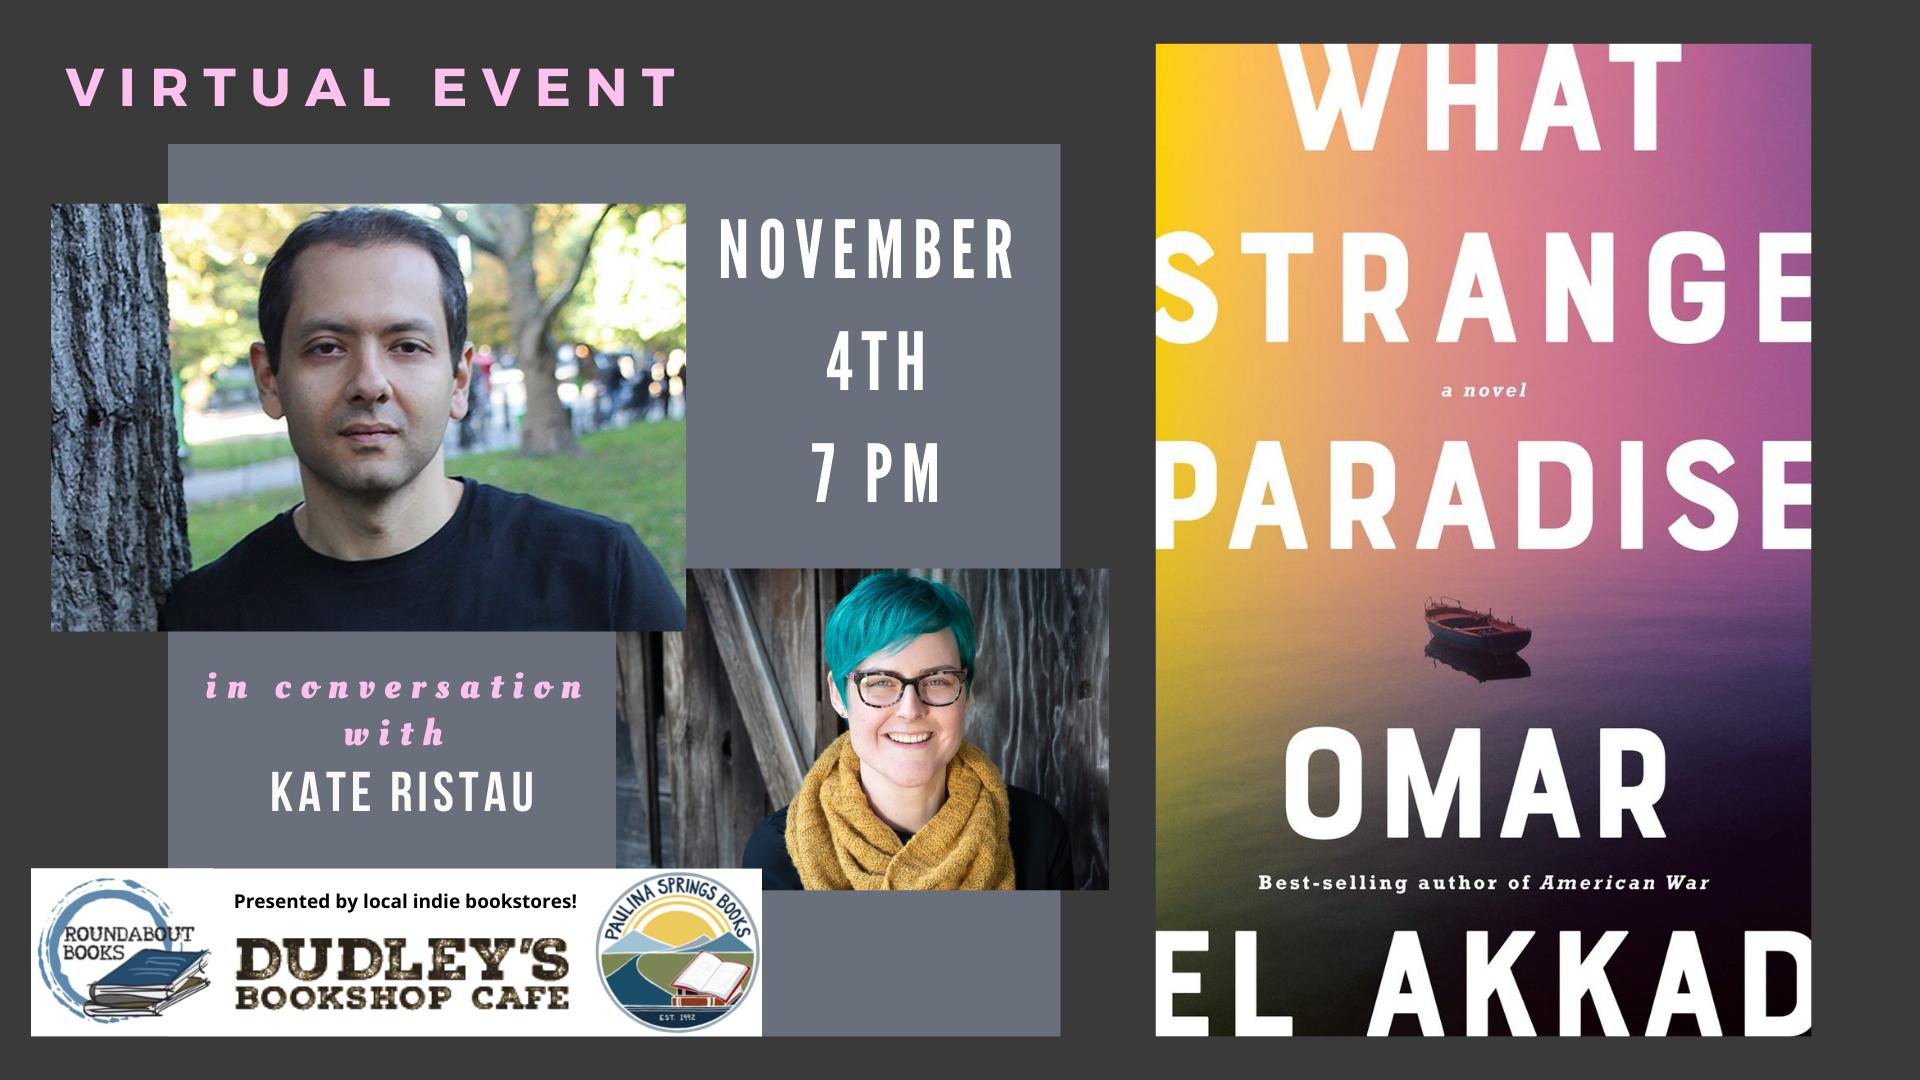 Banner Image promoting Omar El Akkad Event.